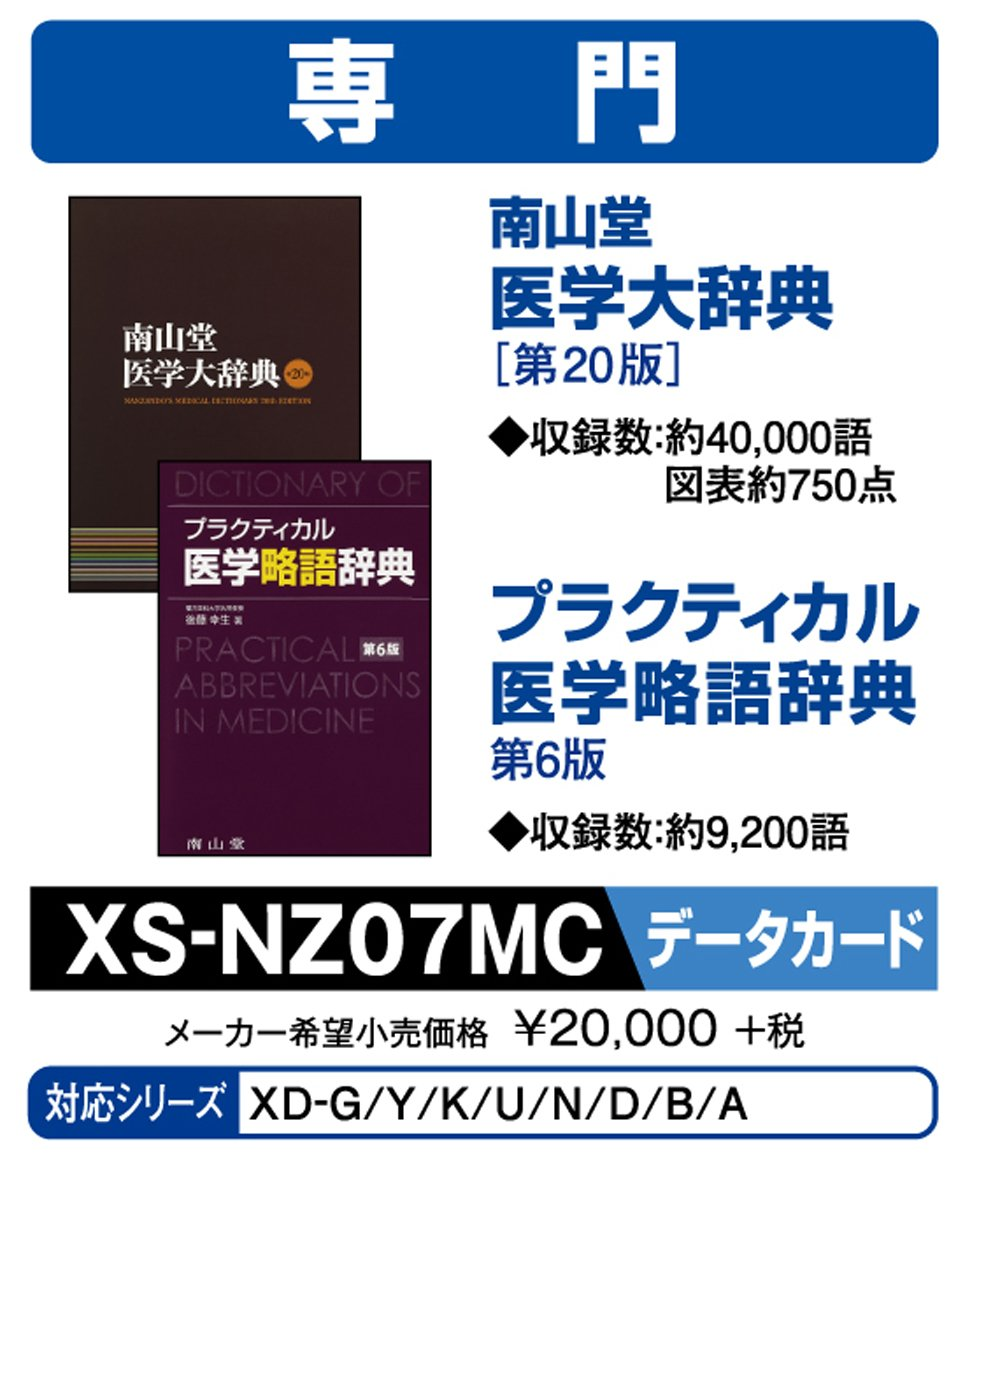 Casio electronic dictionary add content microSD version MinamiyamaDo Medical Dictionary 20th edition Medical Abbreviations Dictionary sixth edition XS-NZ07MC